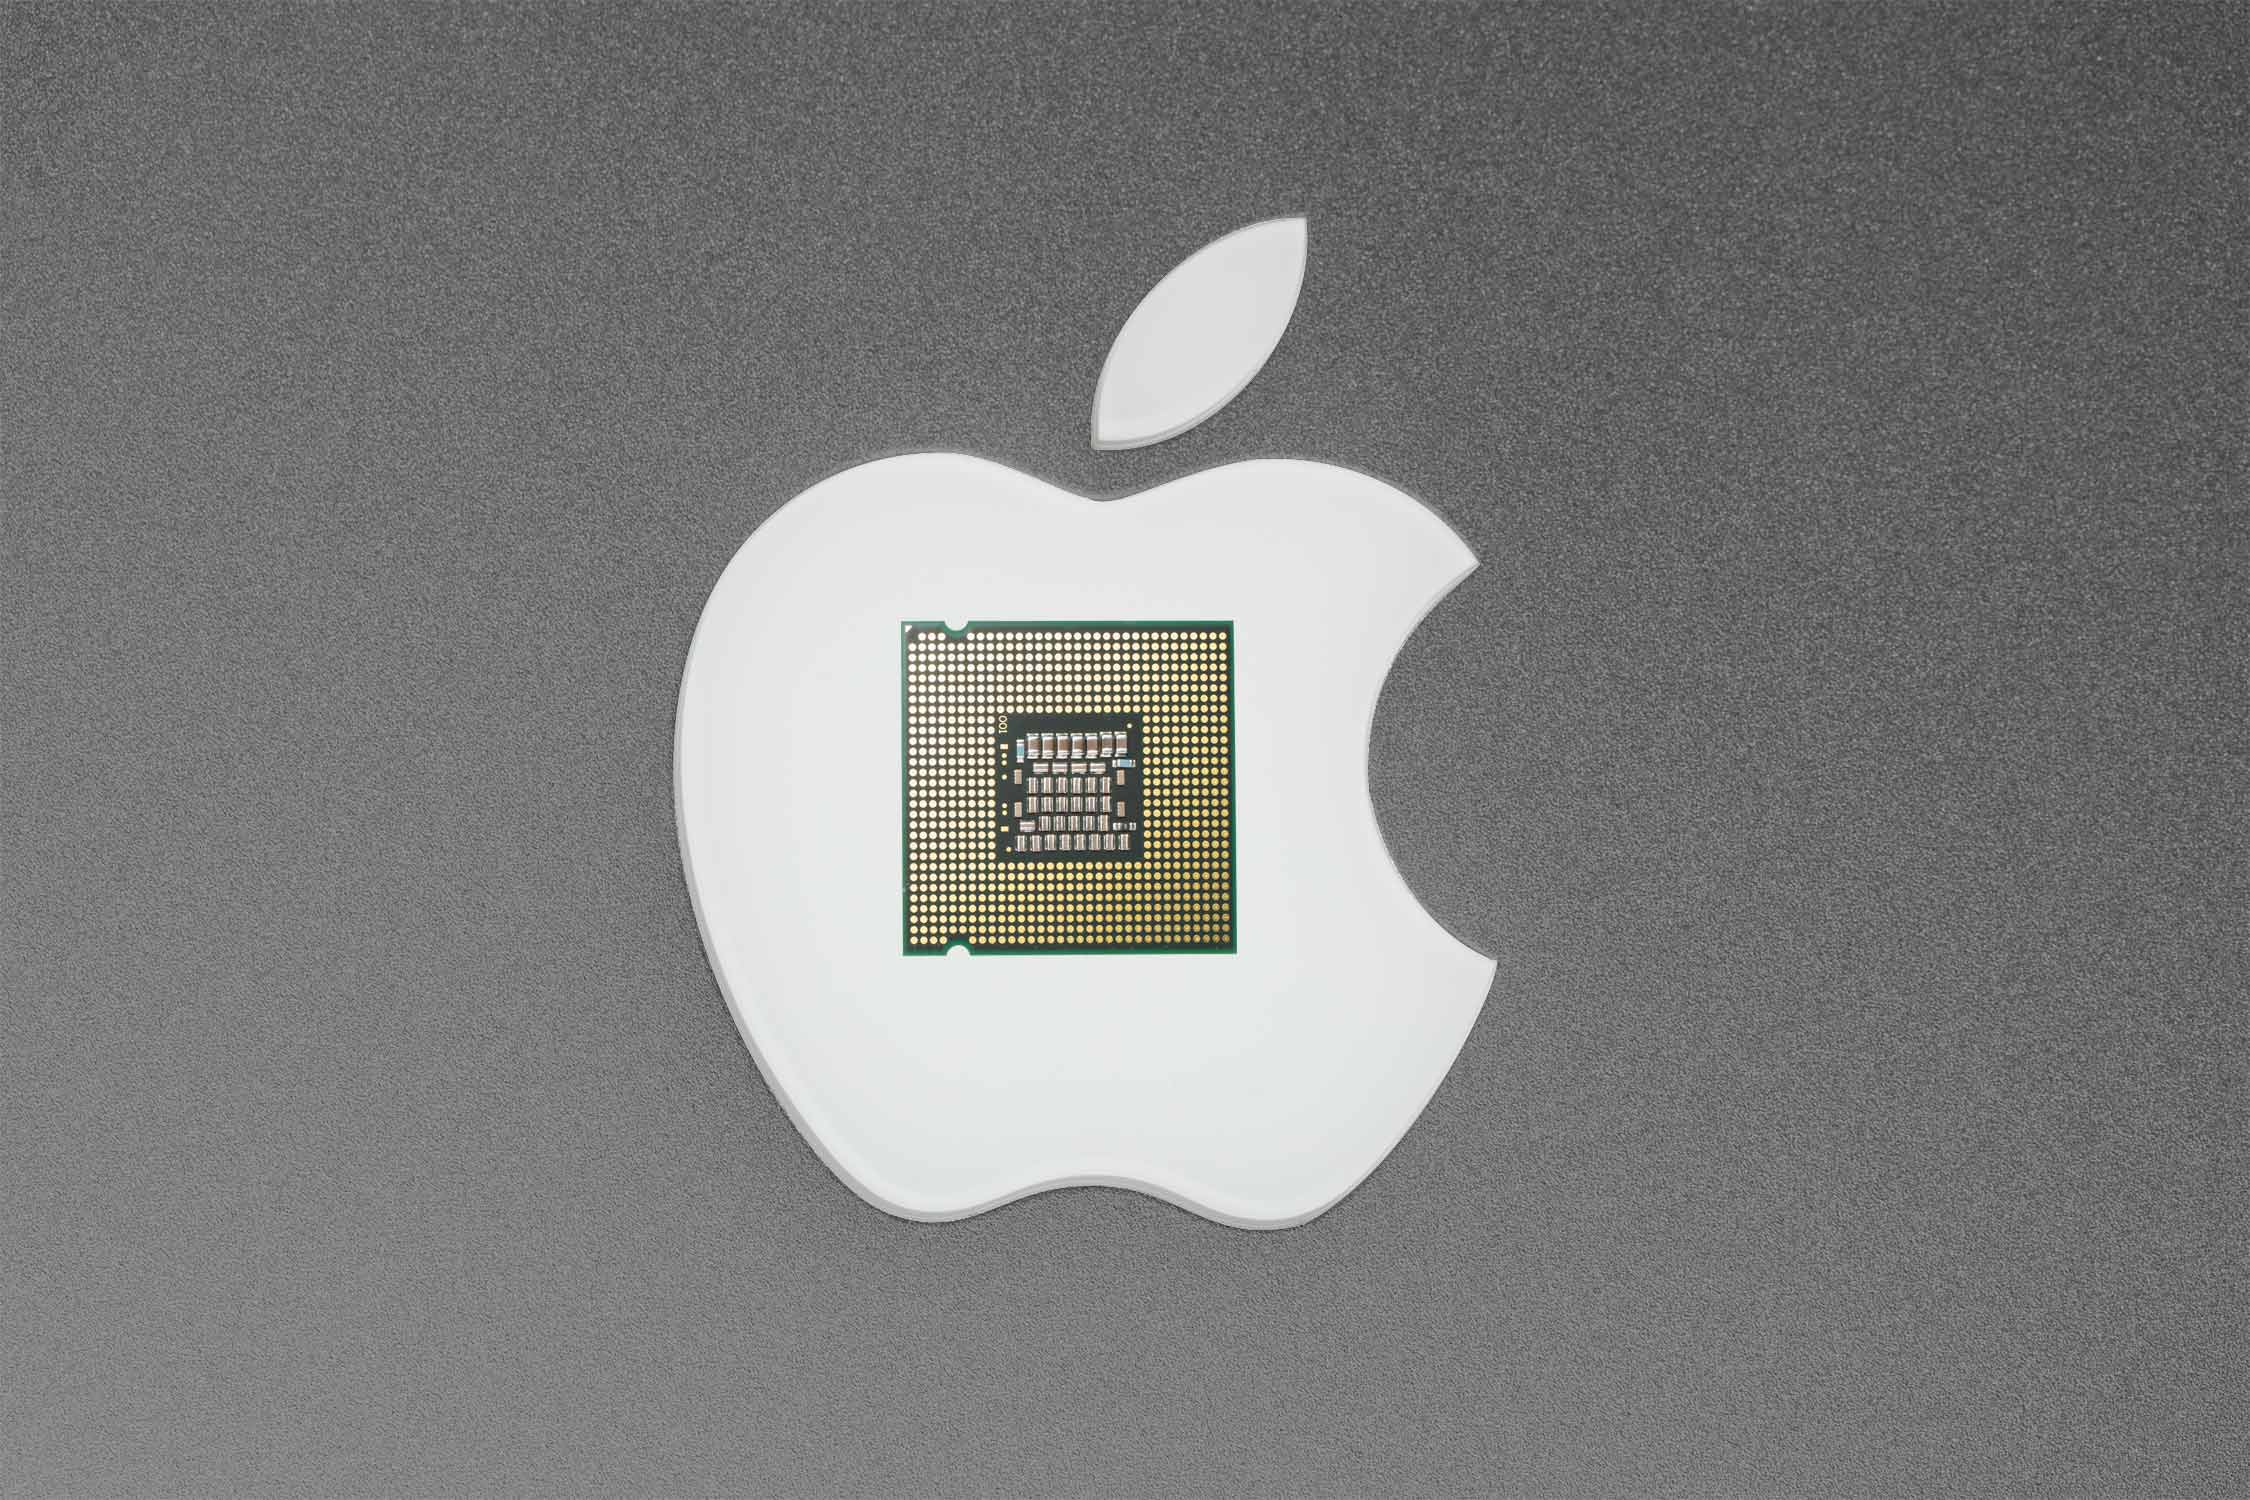 Logo da Apple e chip